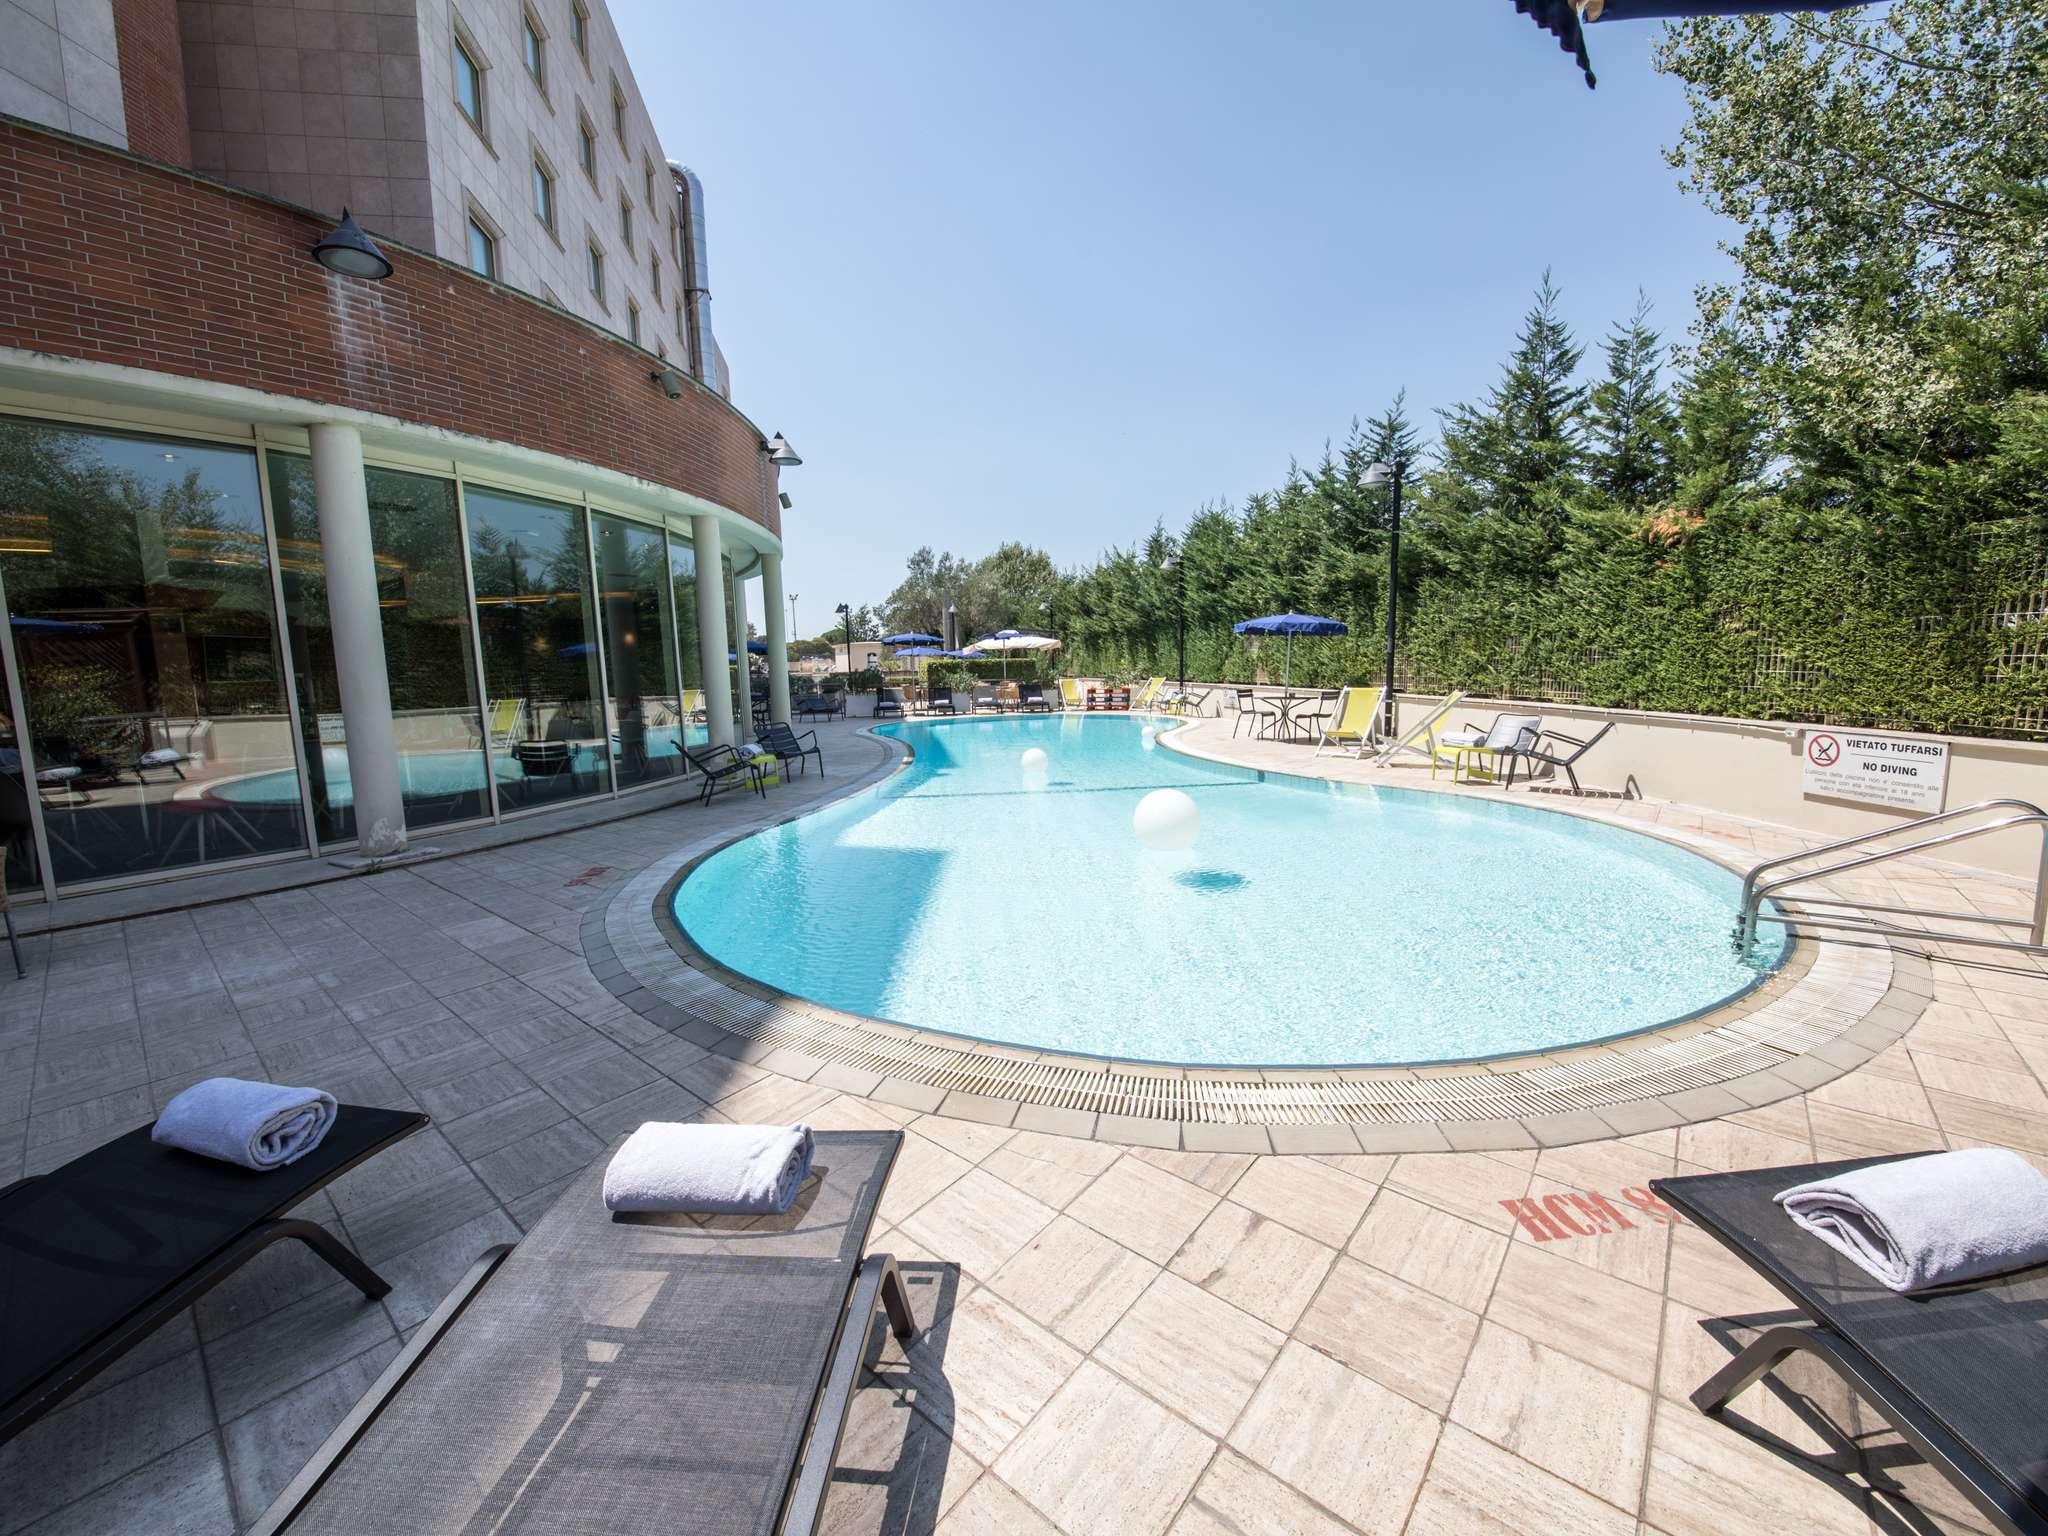 فندق - نوفوتيل Novotel روما ايست